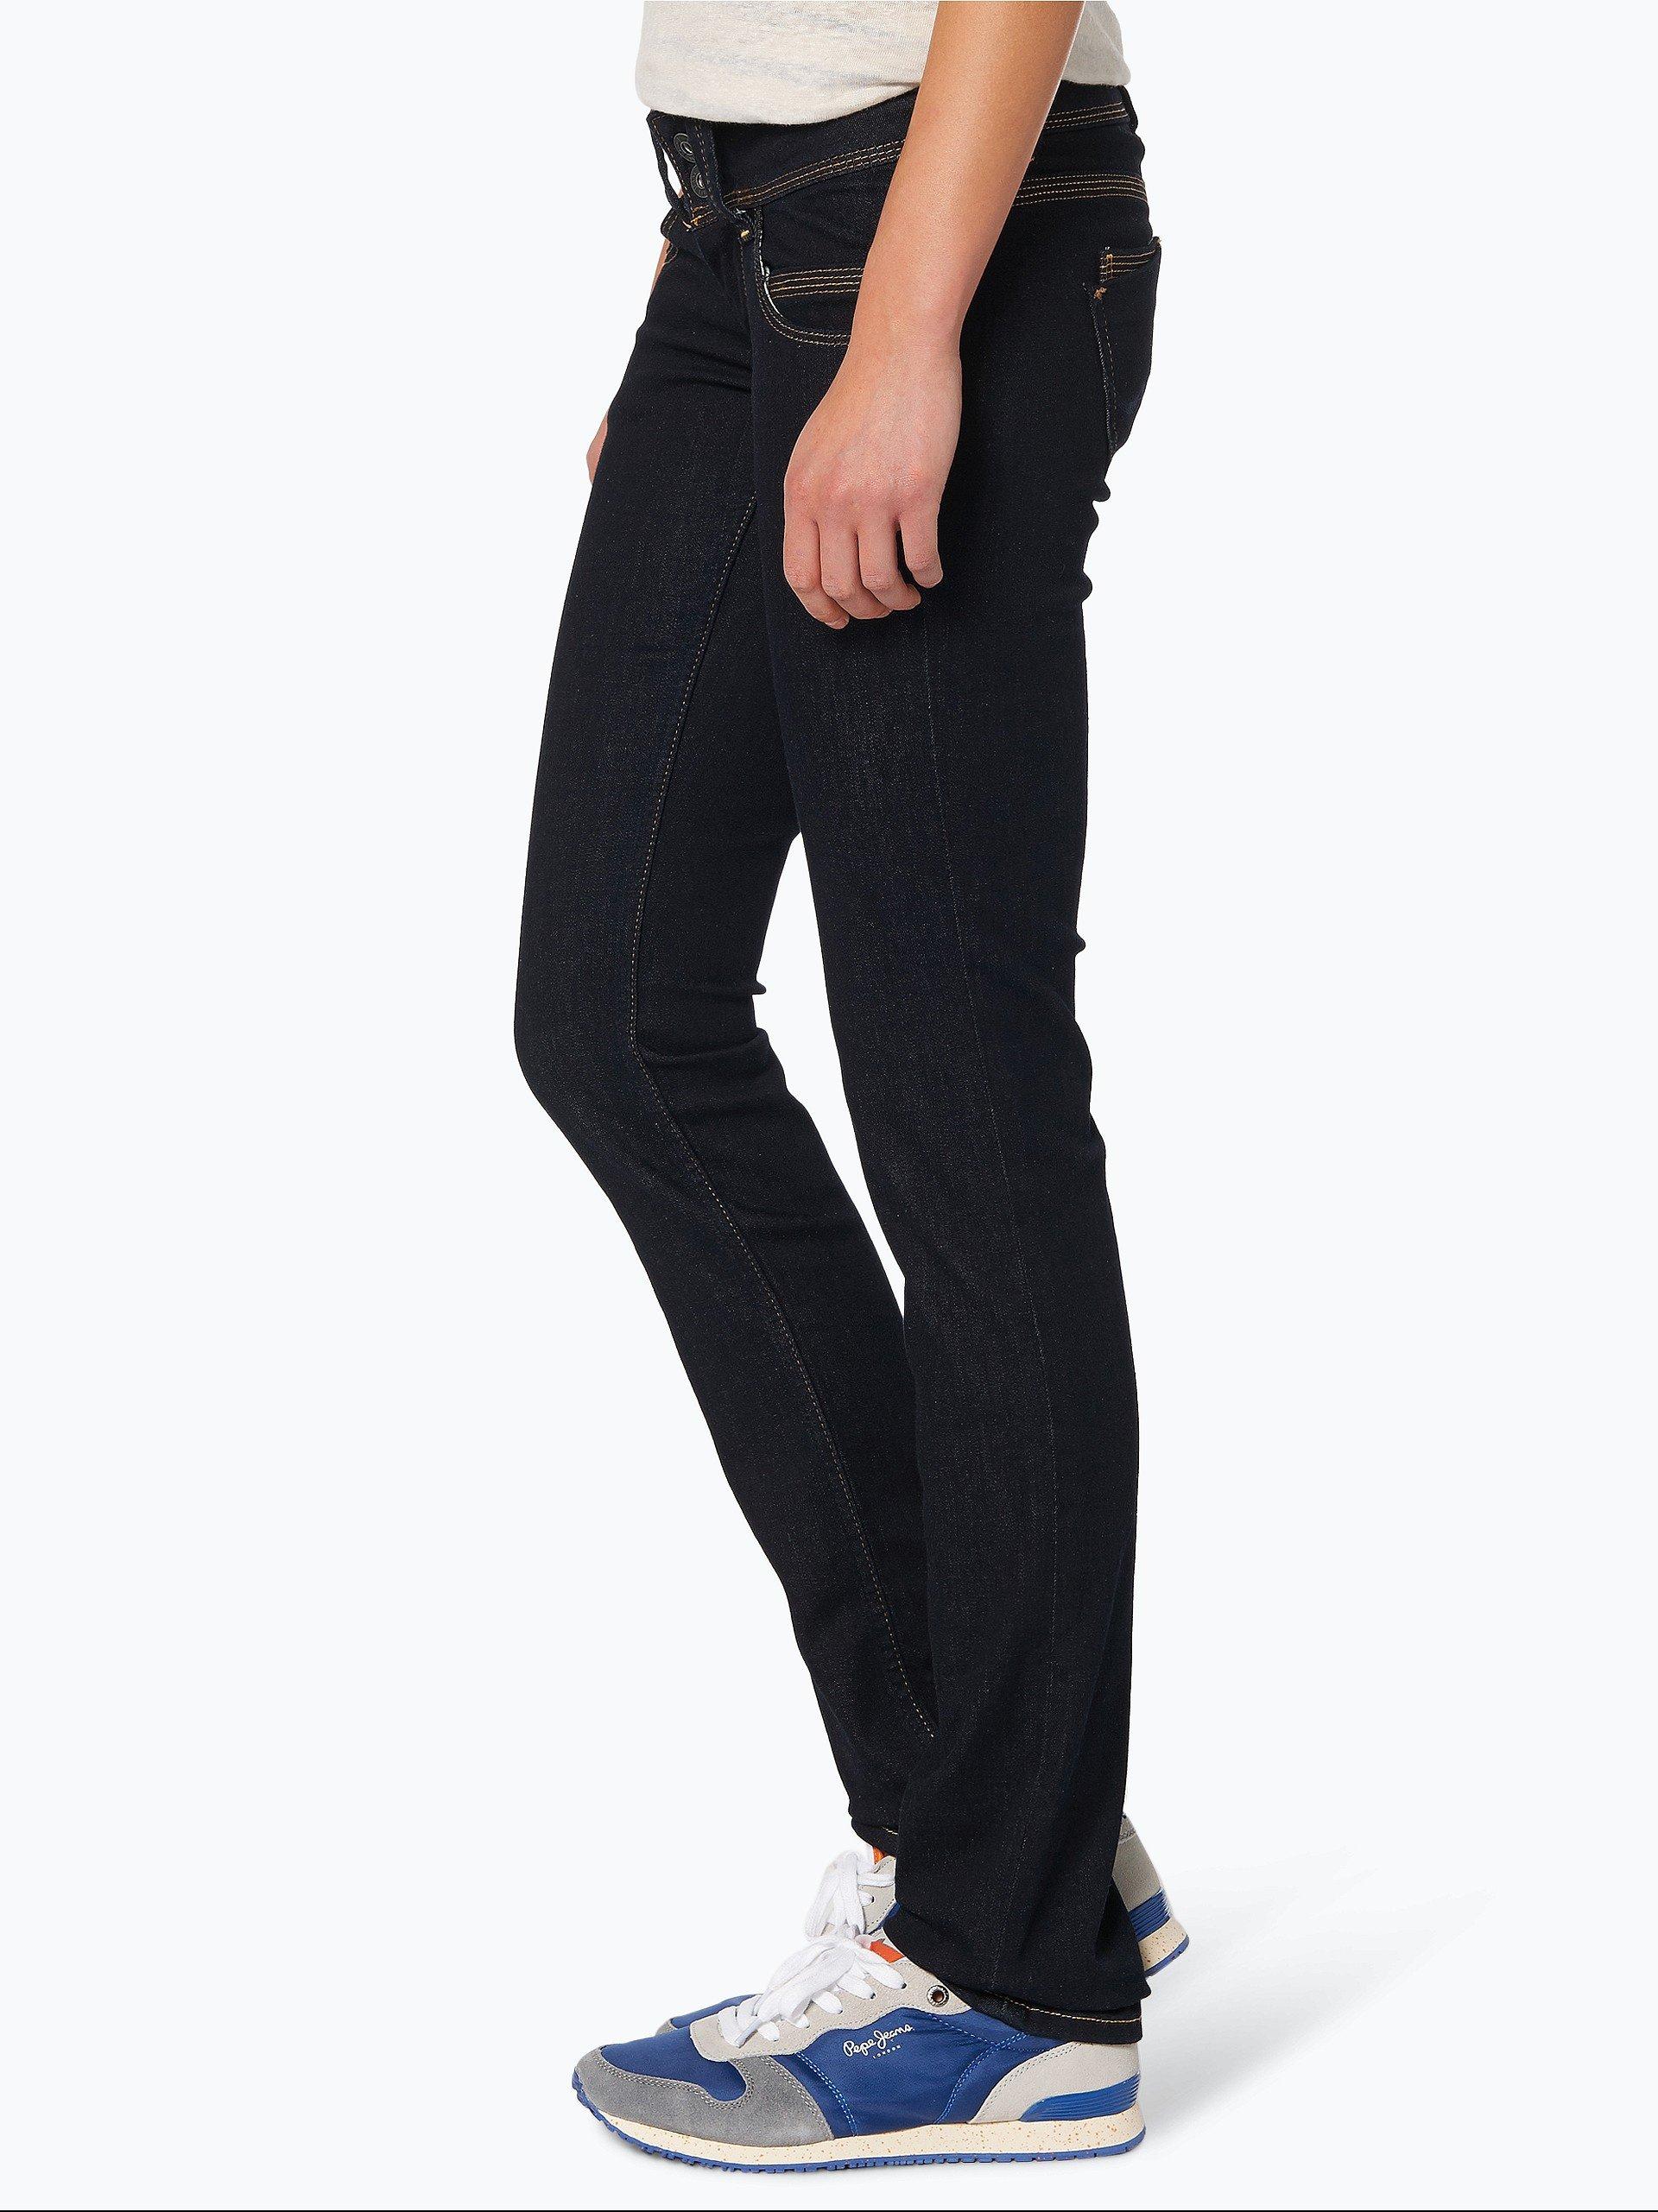 pepe jeans damen jeans venus blau uni online kaufen peek und cloppenburg de. Black Bedroom Furniture Sets. Home Design Ideas